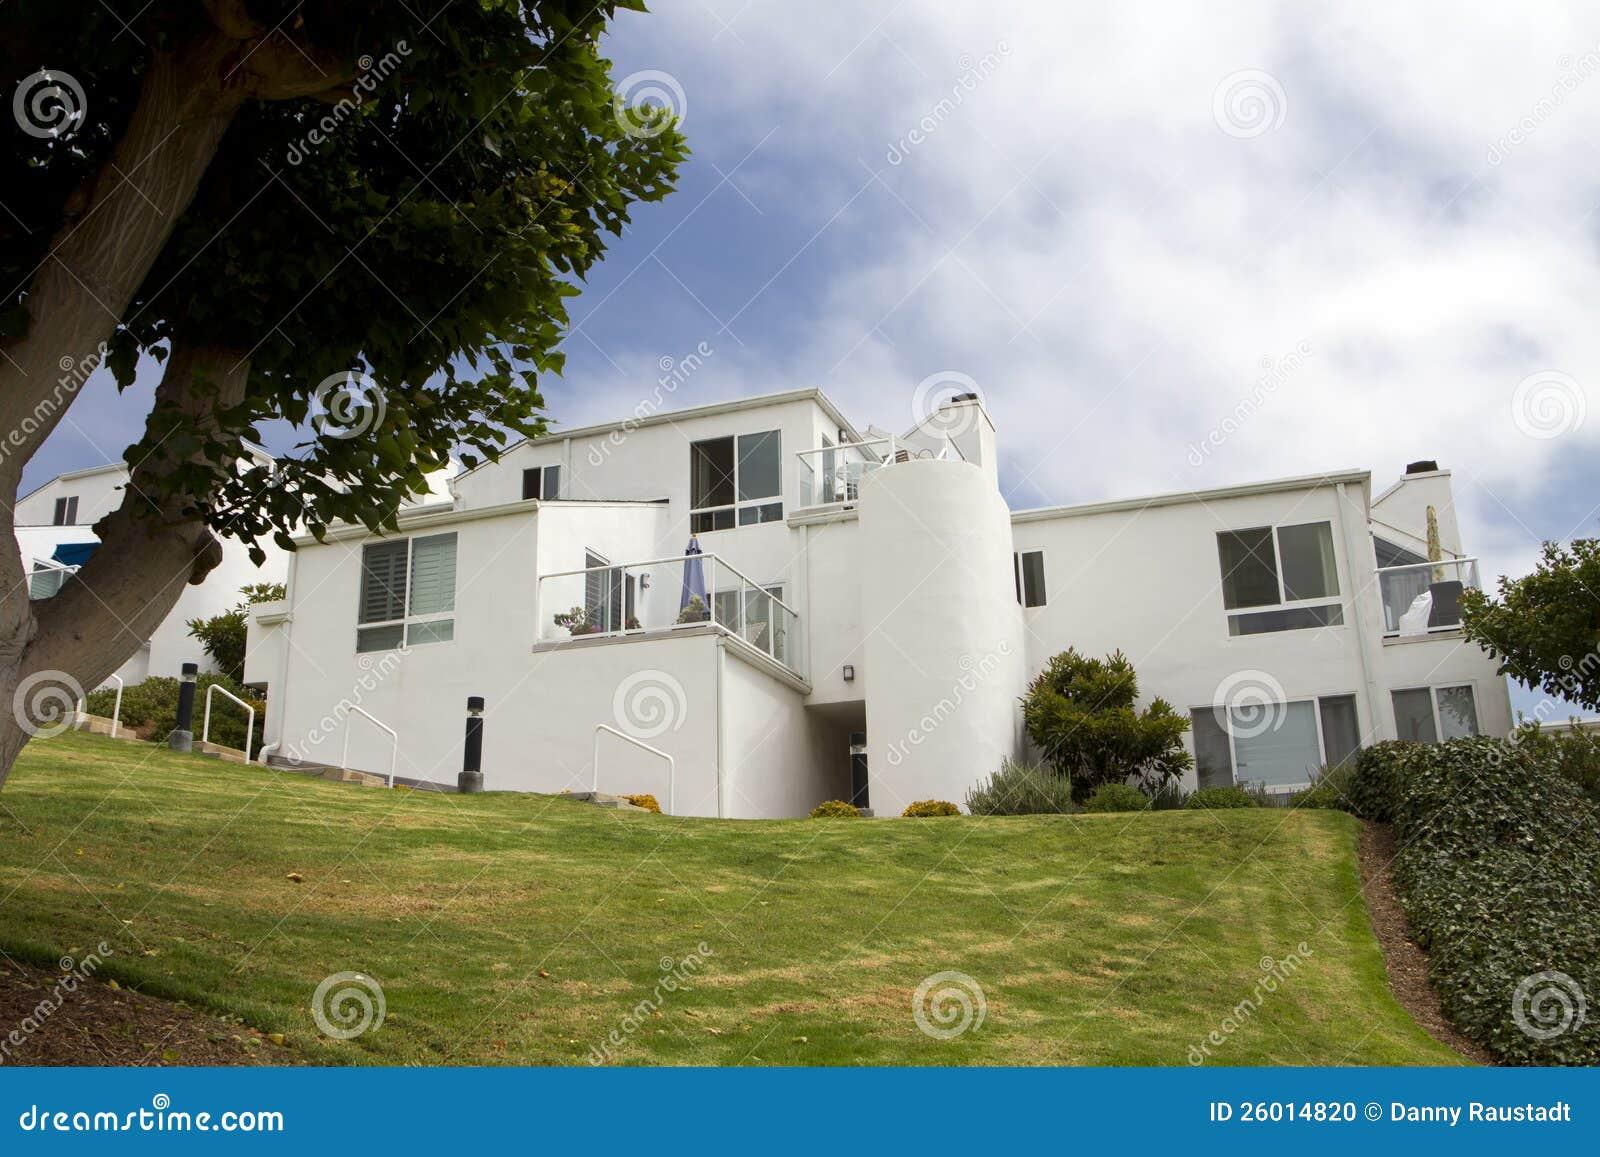 Casas blancas modernas en una colina en california foto de - Casas blancas modernas ...